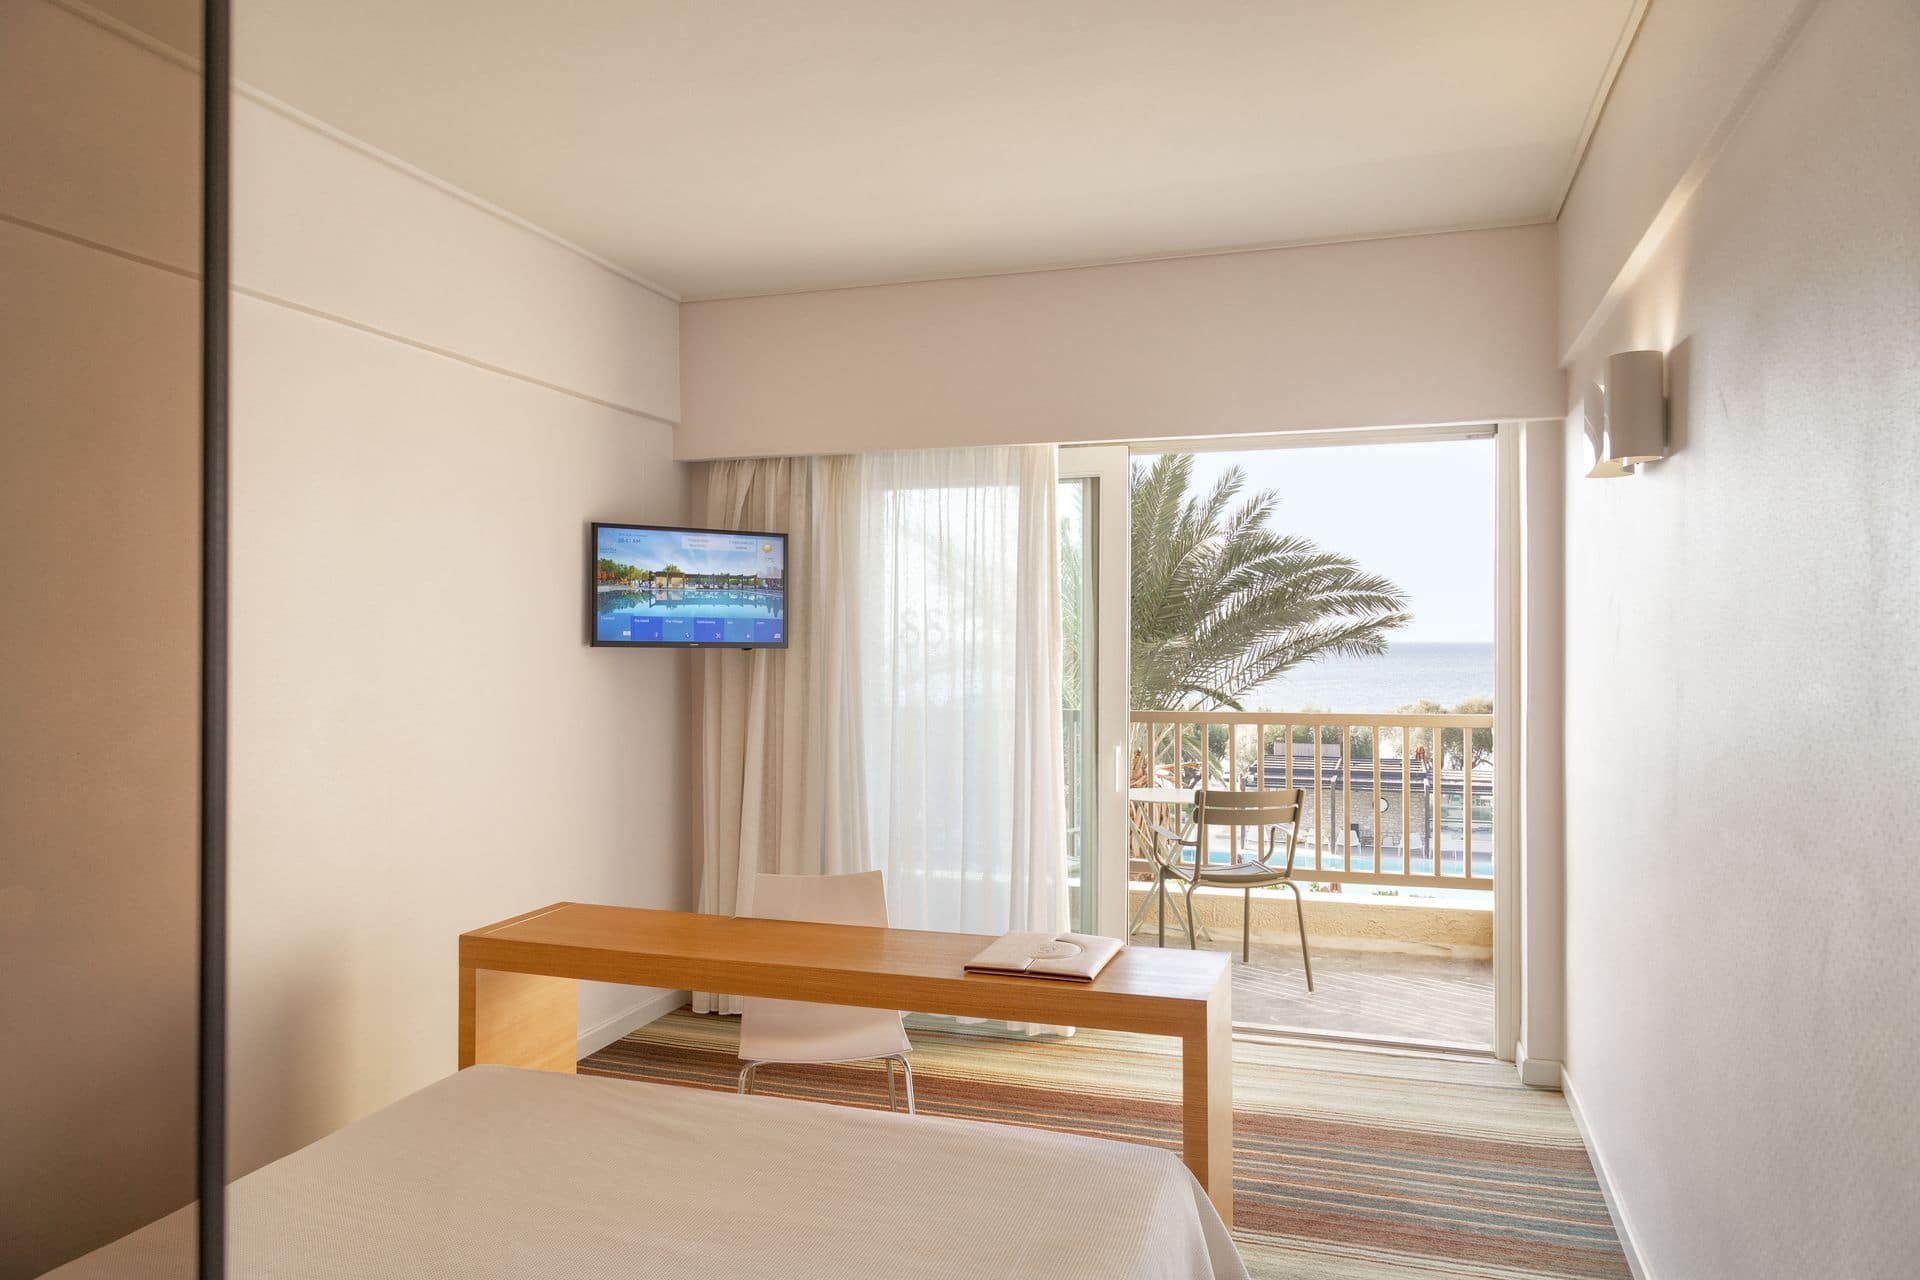 An in-room view of Doryssa Seaside's seaview suites in Samos